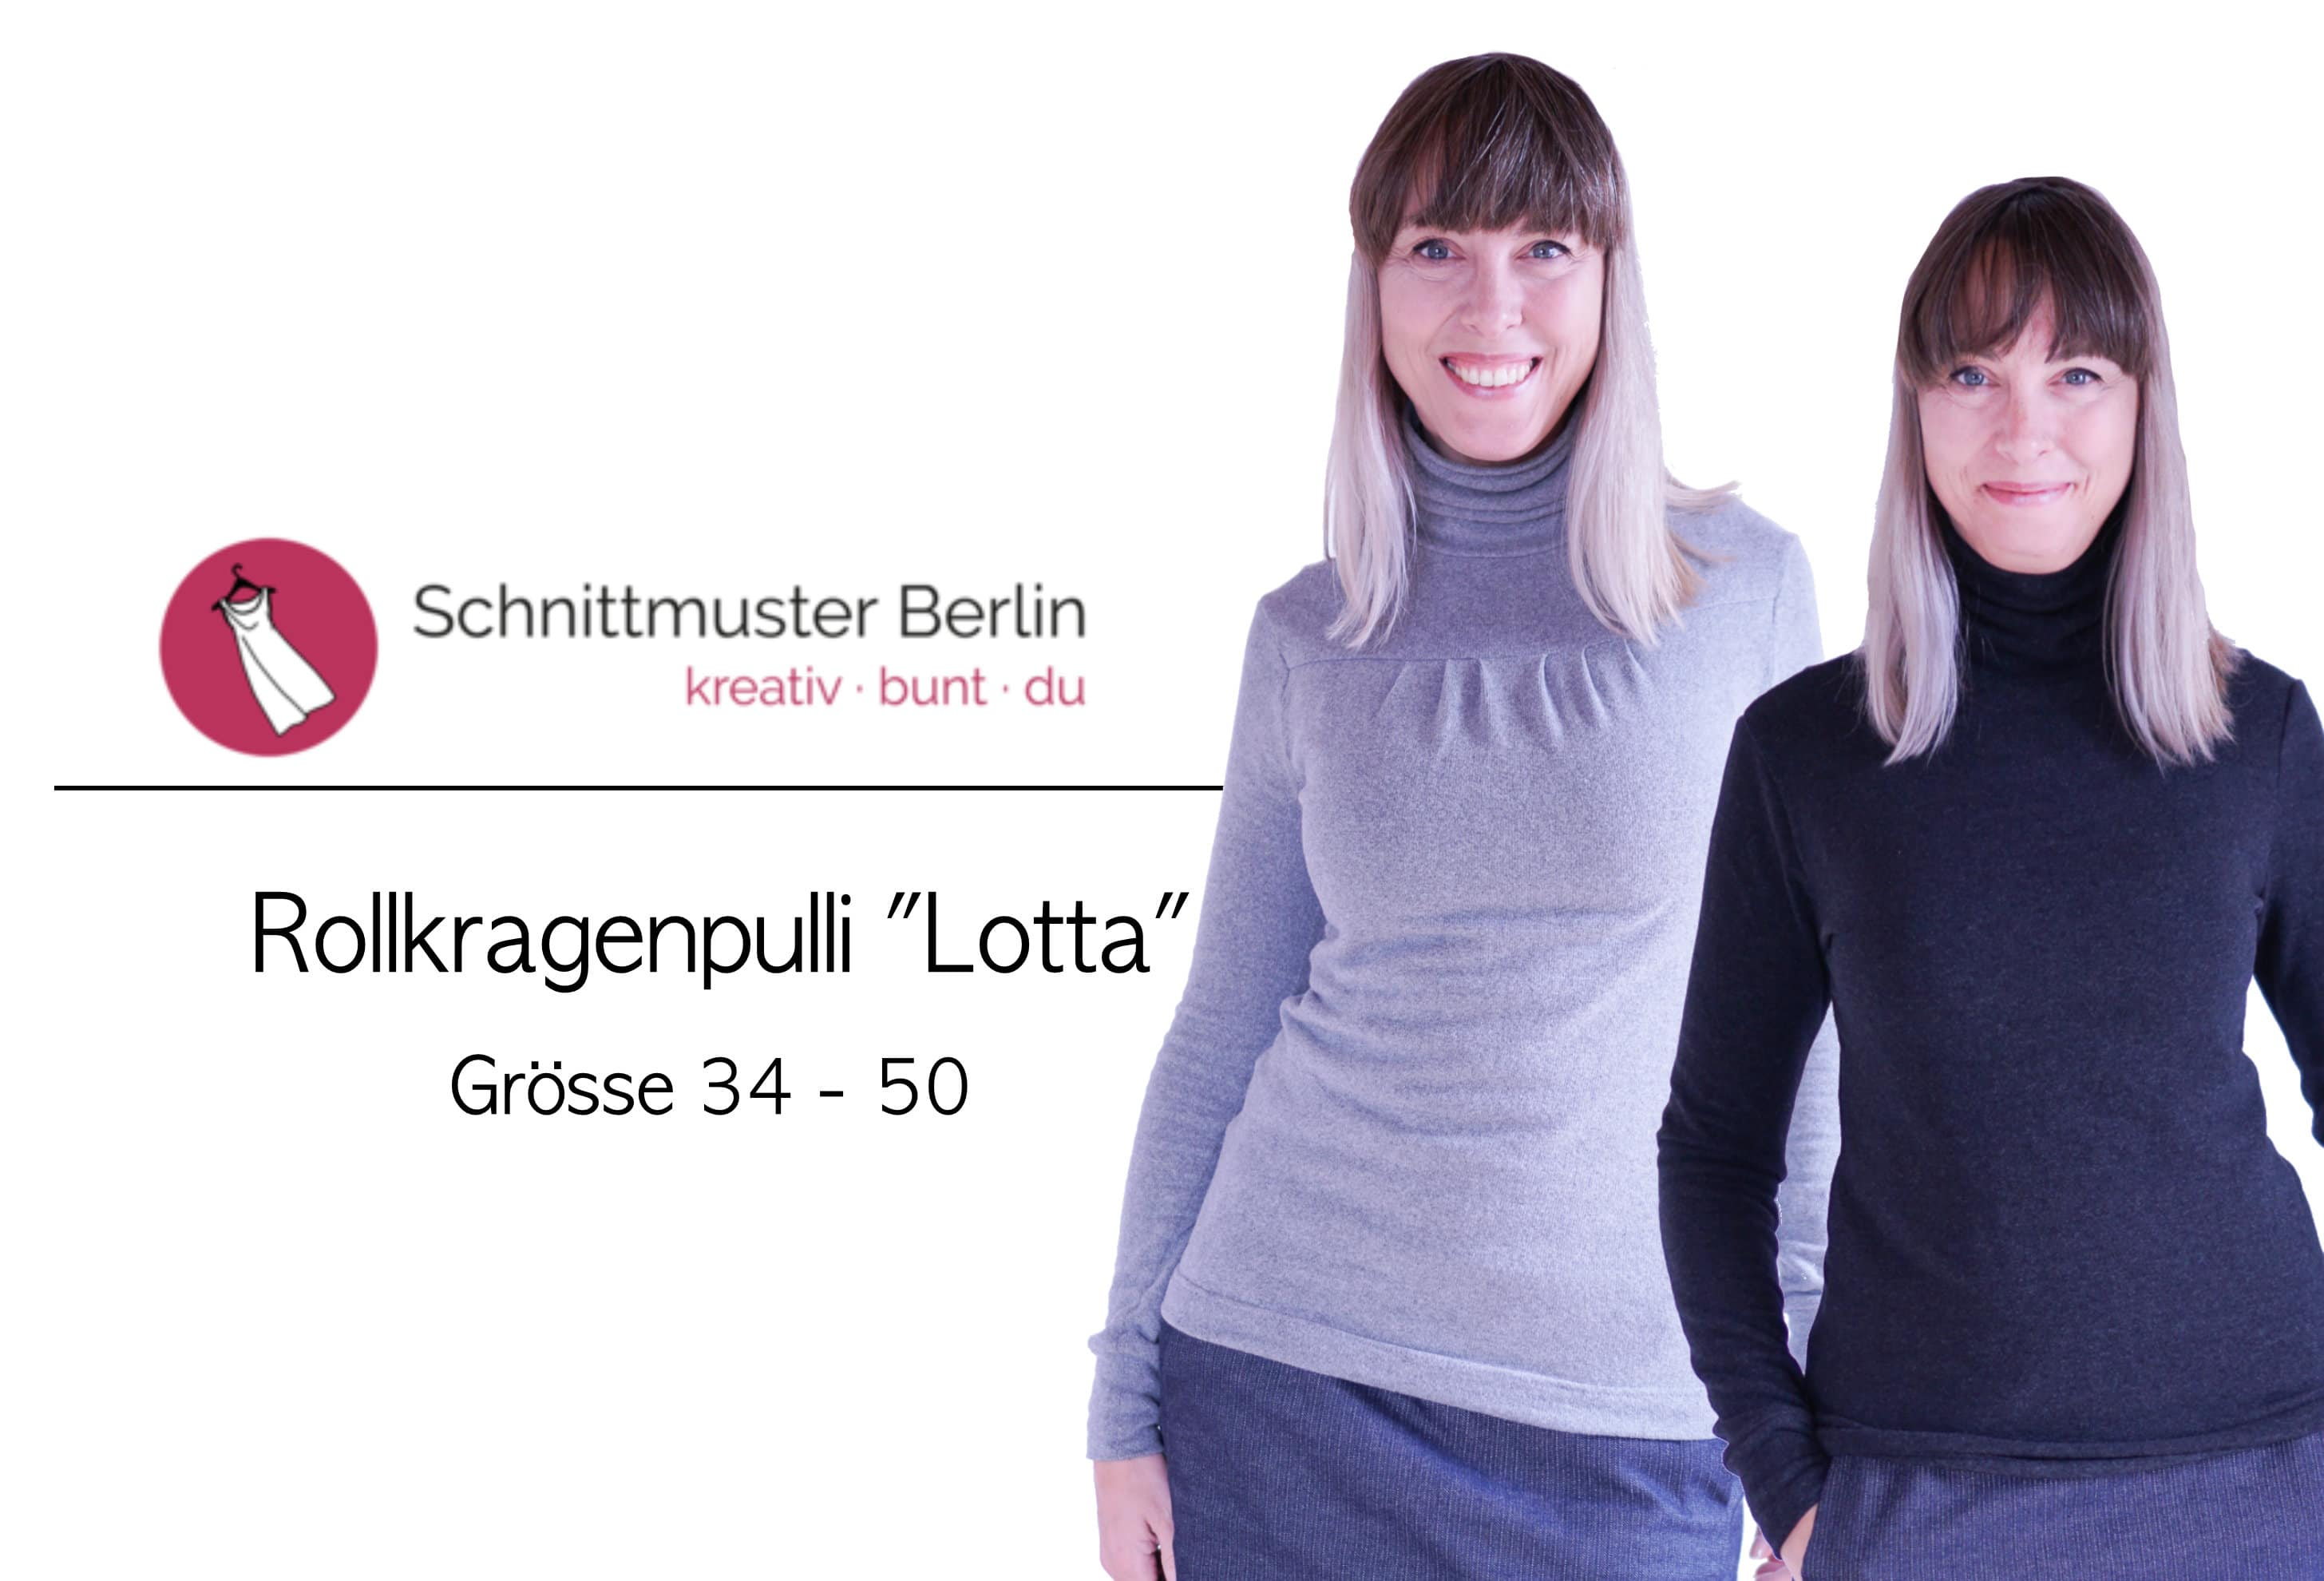 Lotta Schnittmuster Berlin | einfach nähen lernen